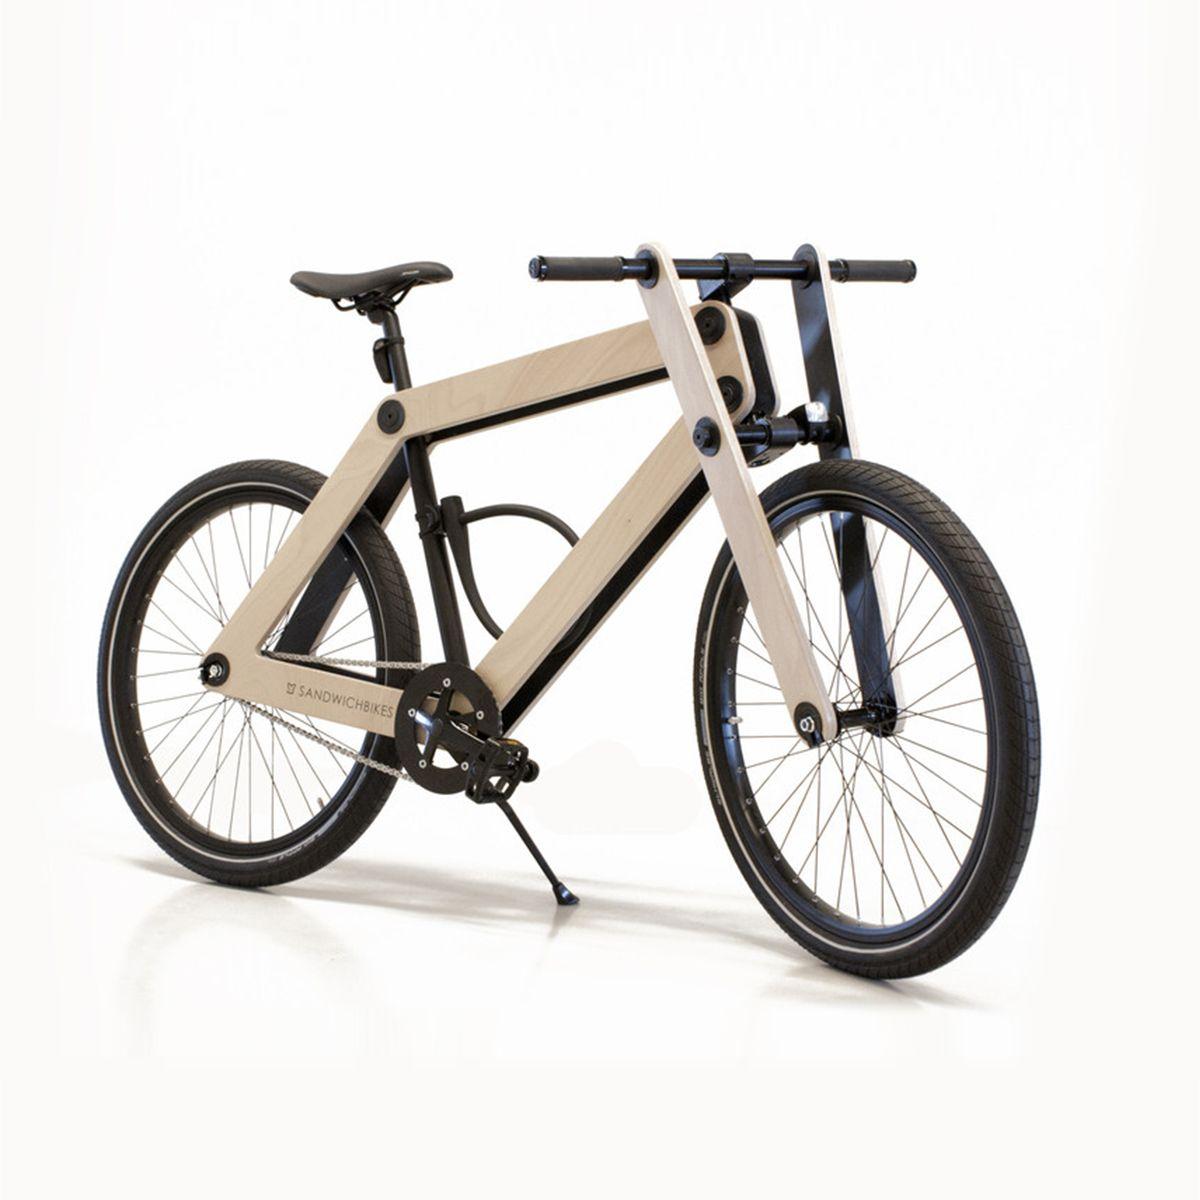 Sandwichbikes Wooden Bike Bicycle Bike Design